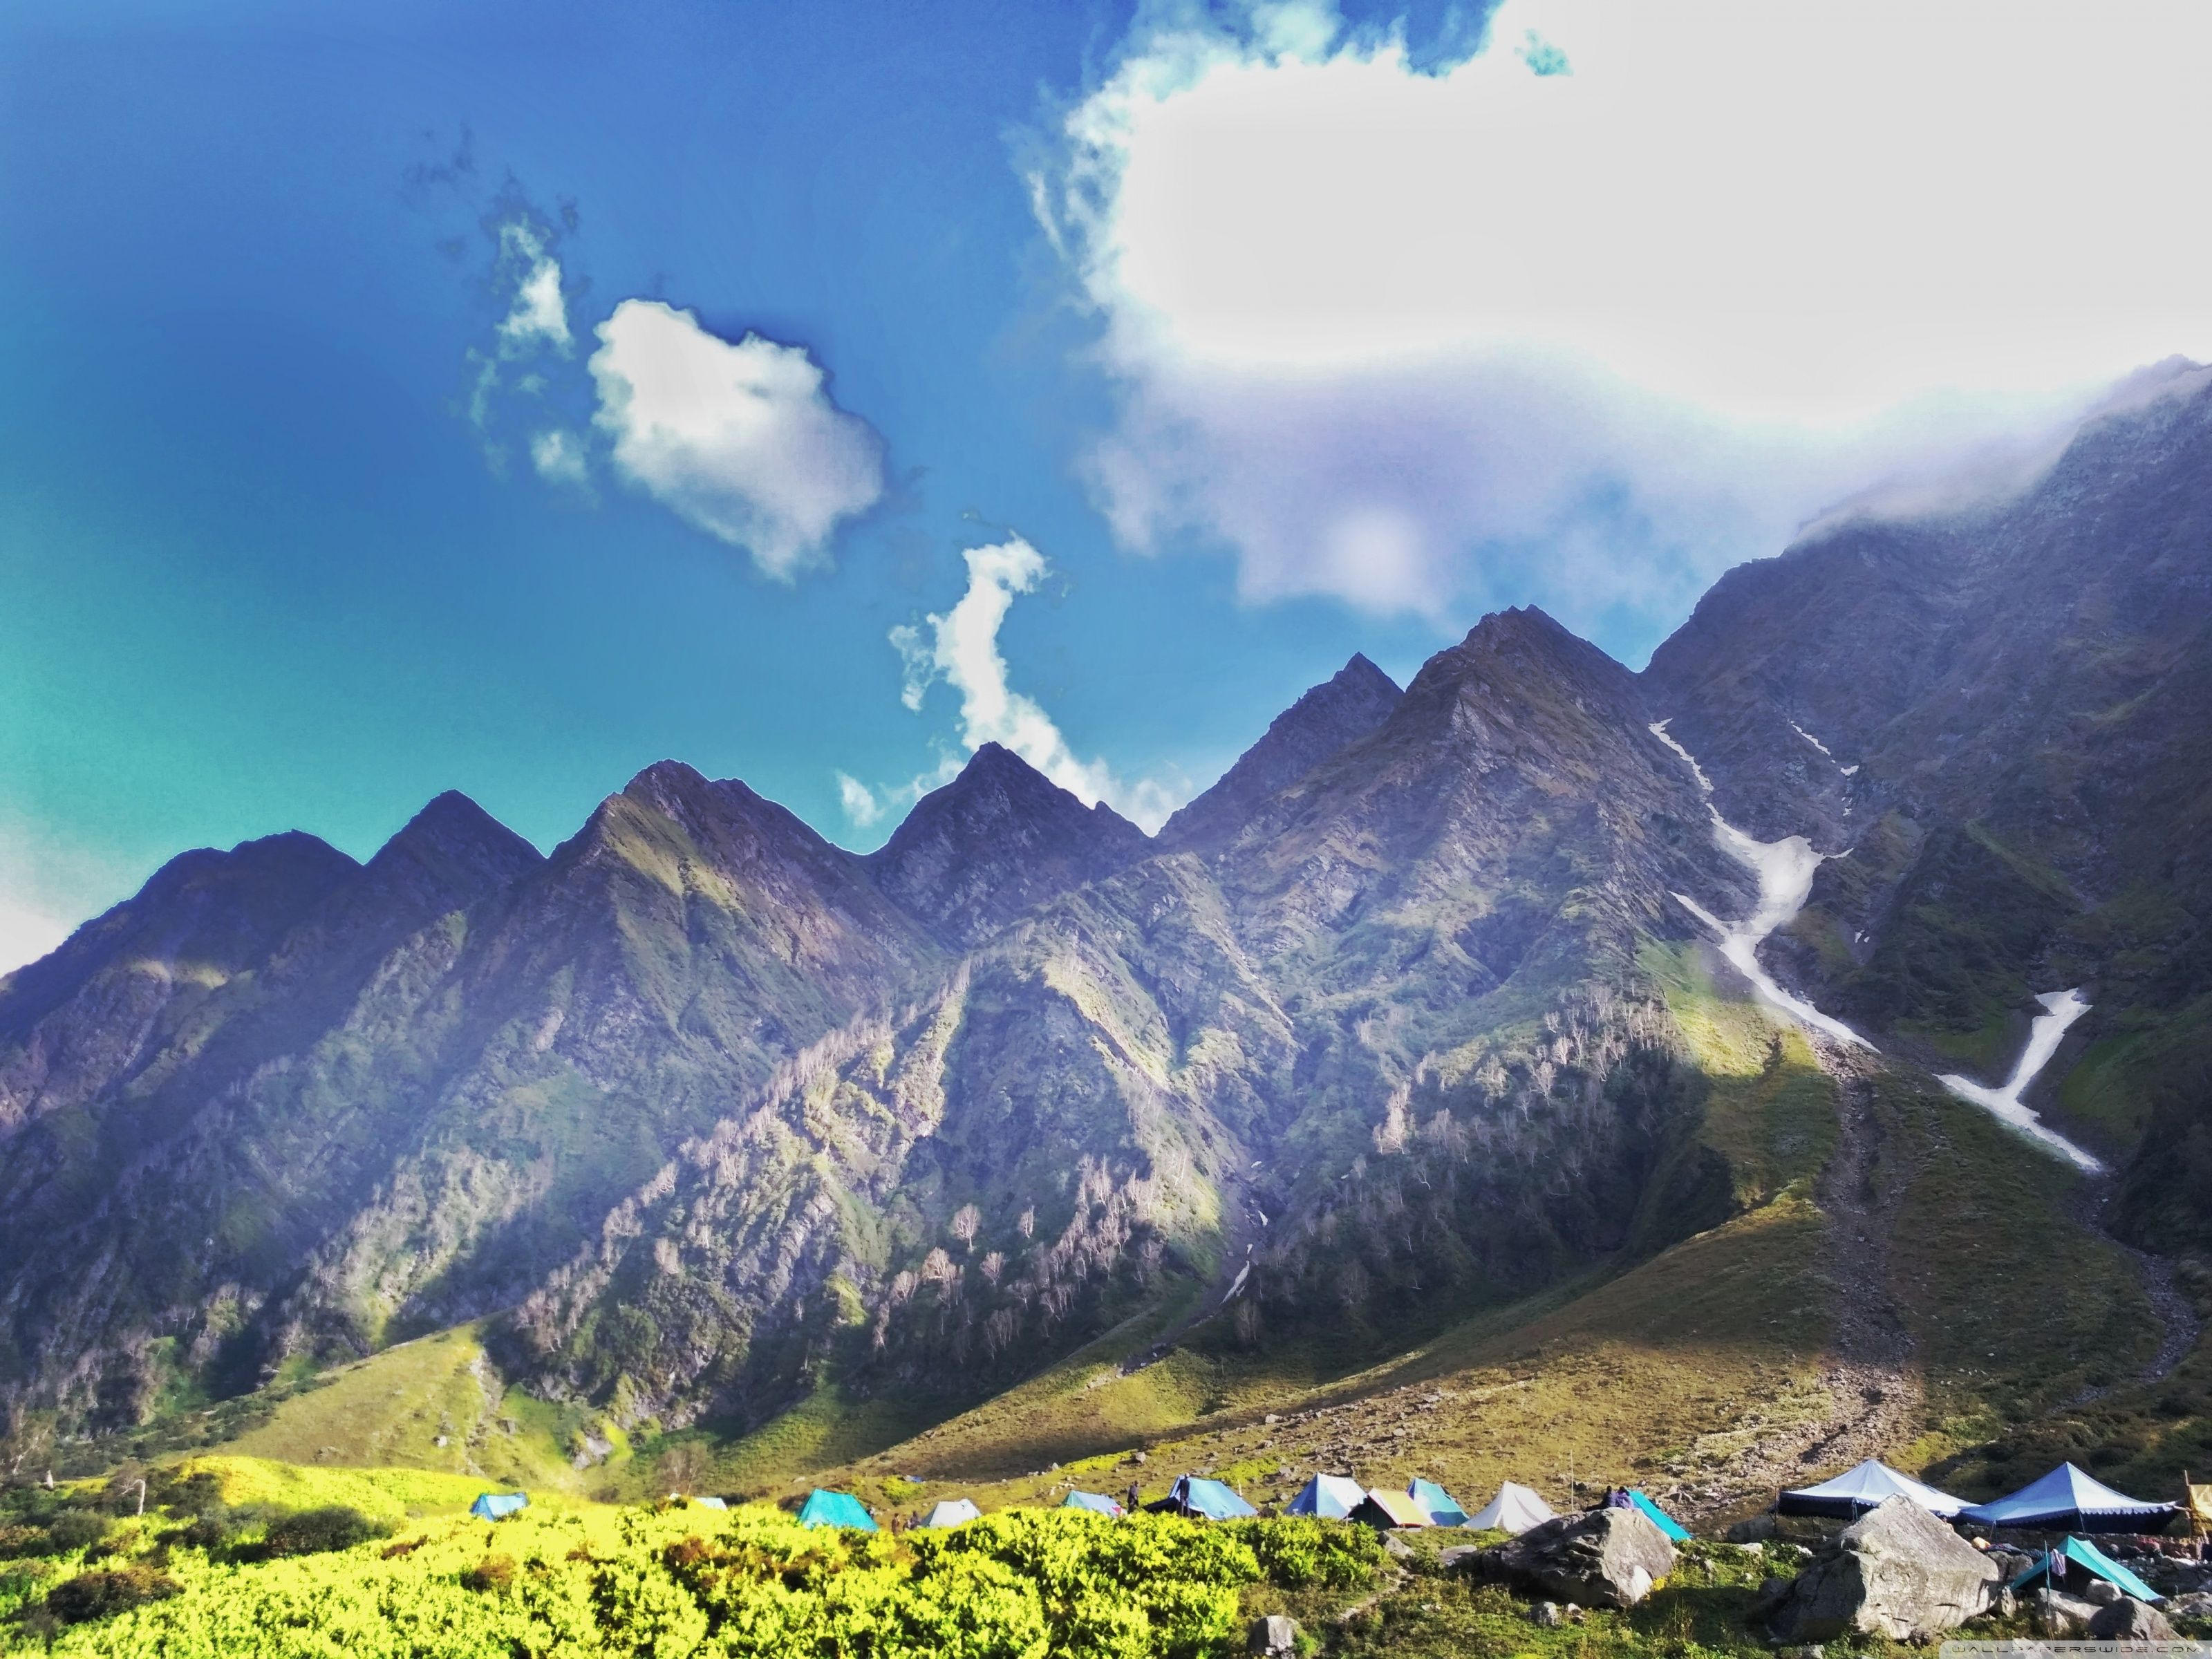 Himachal Pradesh Wallpapers Top Free Himachal Pradesh Backgrounds Wallpaperaccess